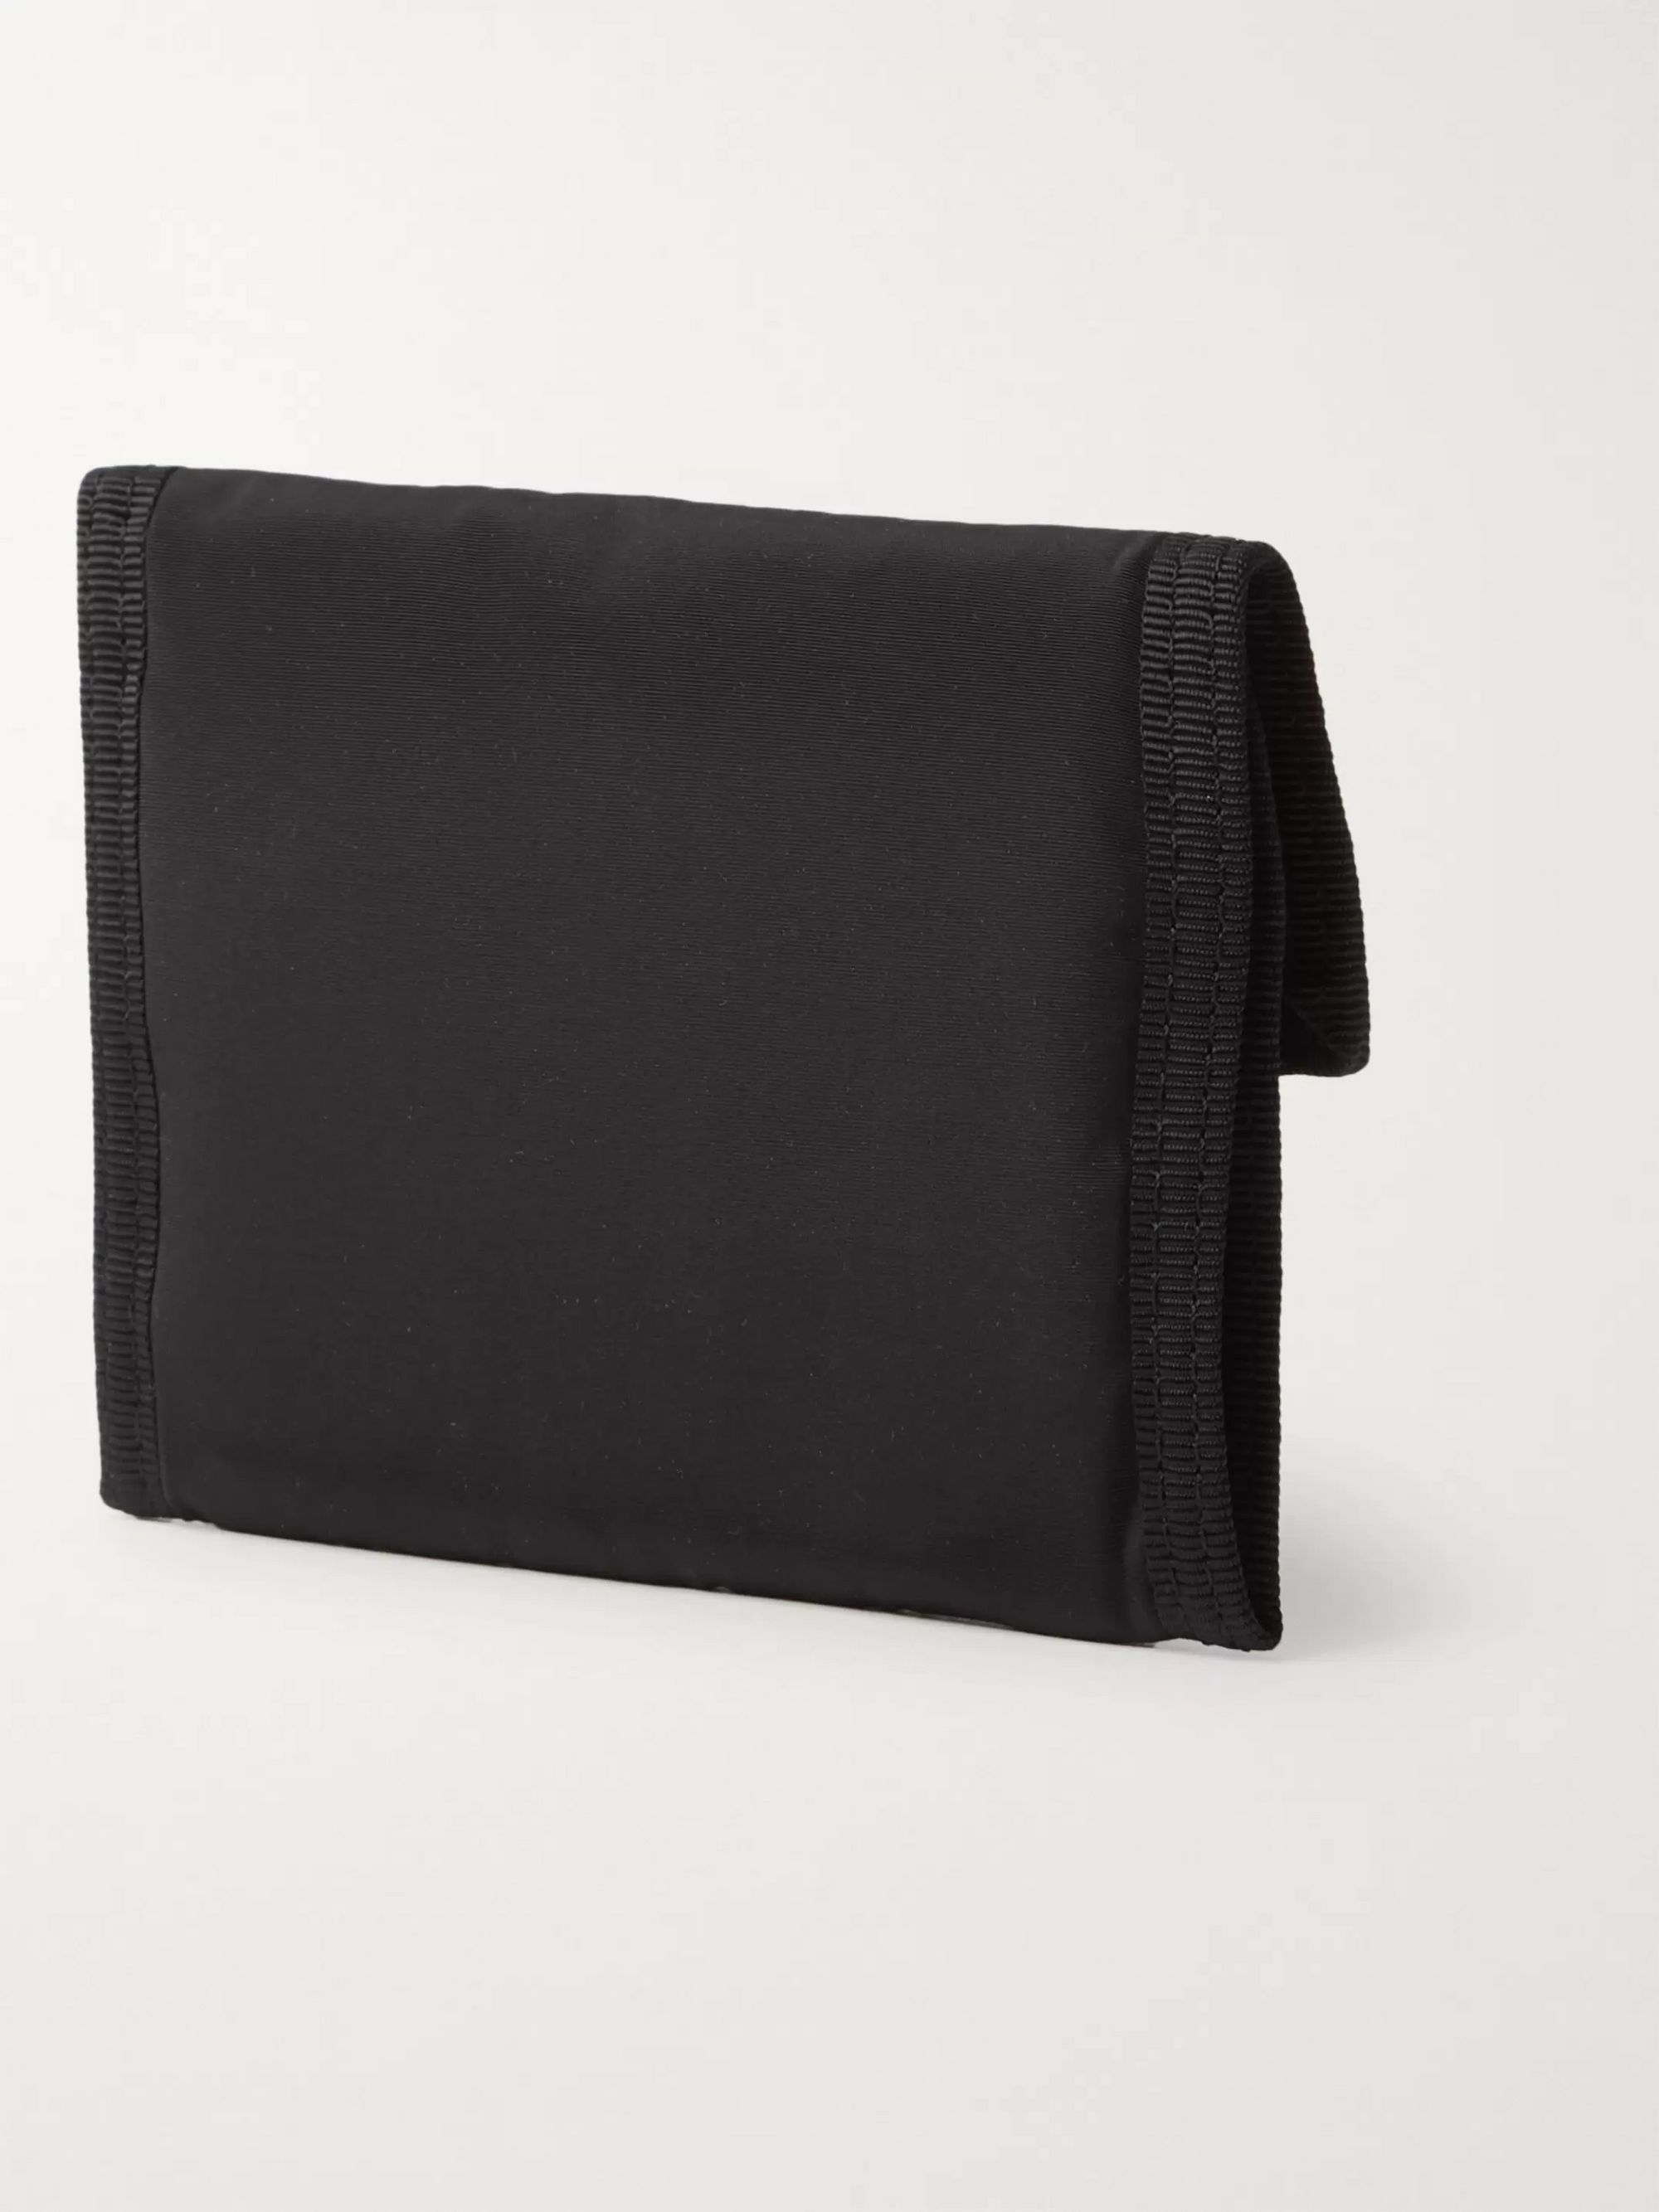 Black + Porter-yoshida & Co Logo-appliquéd Ripstop Billfold Wallet | Neighborhood